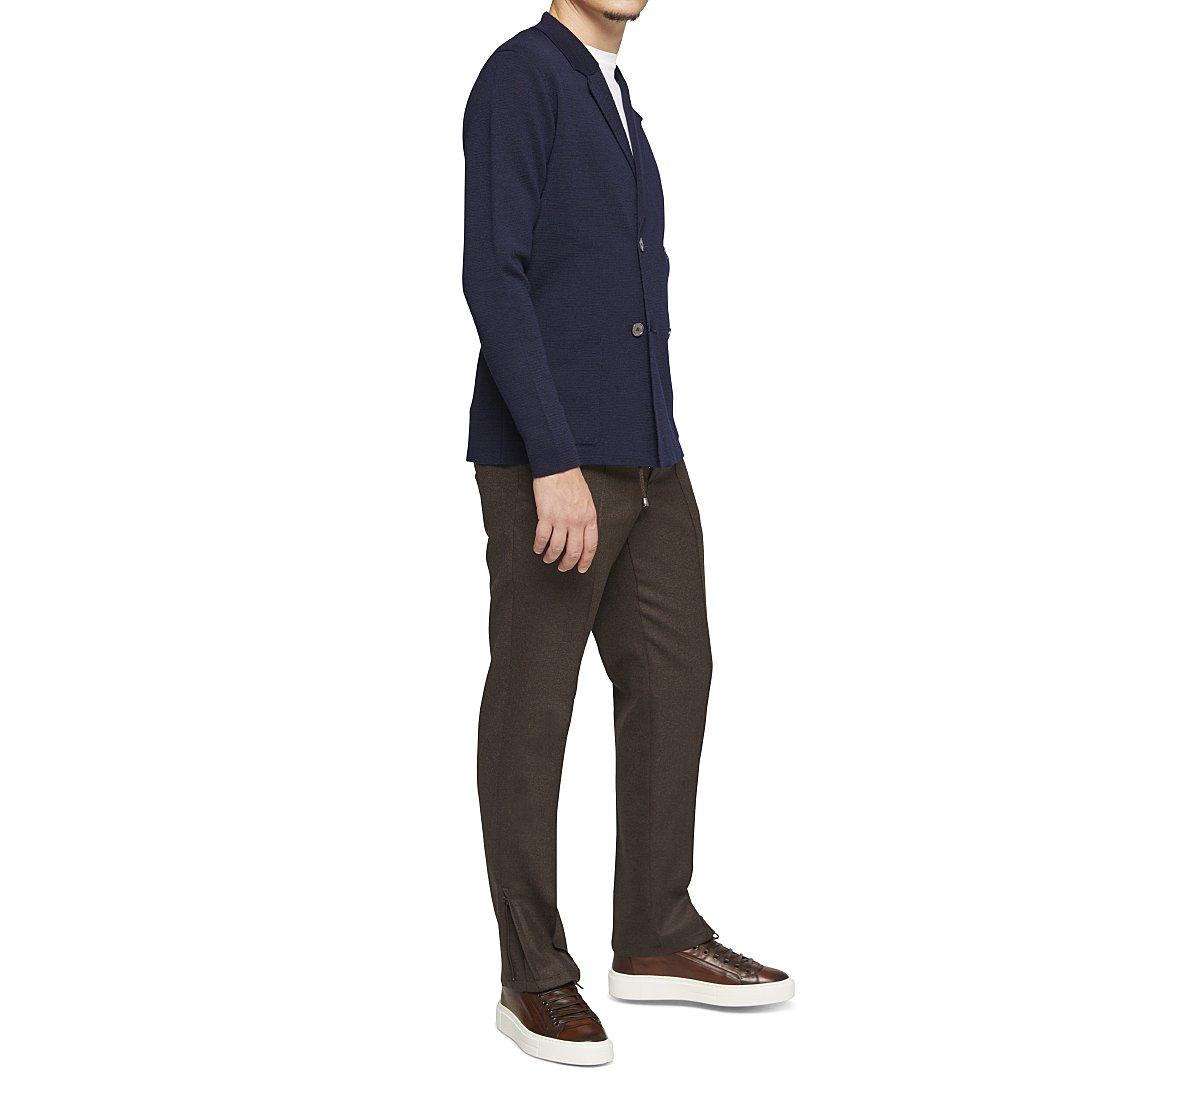 Pantaloni carrot fit in lana